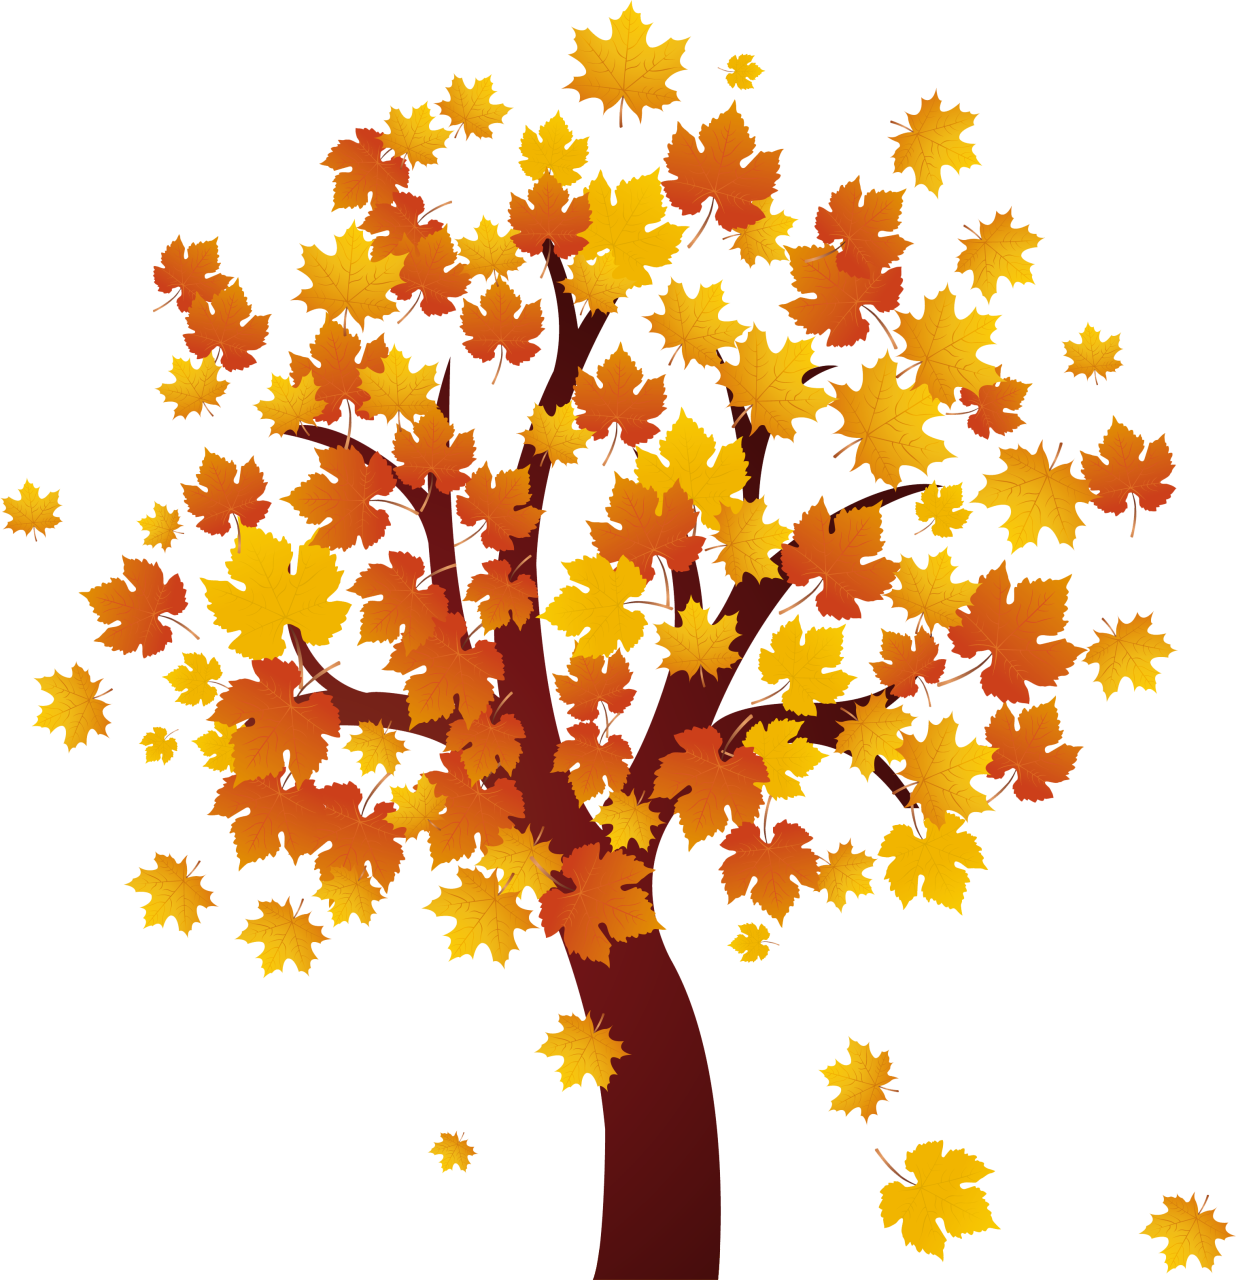 Clip art for autumn.